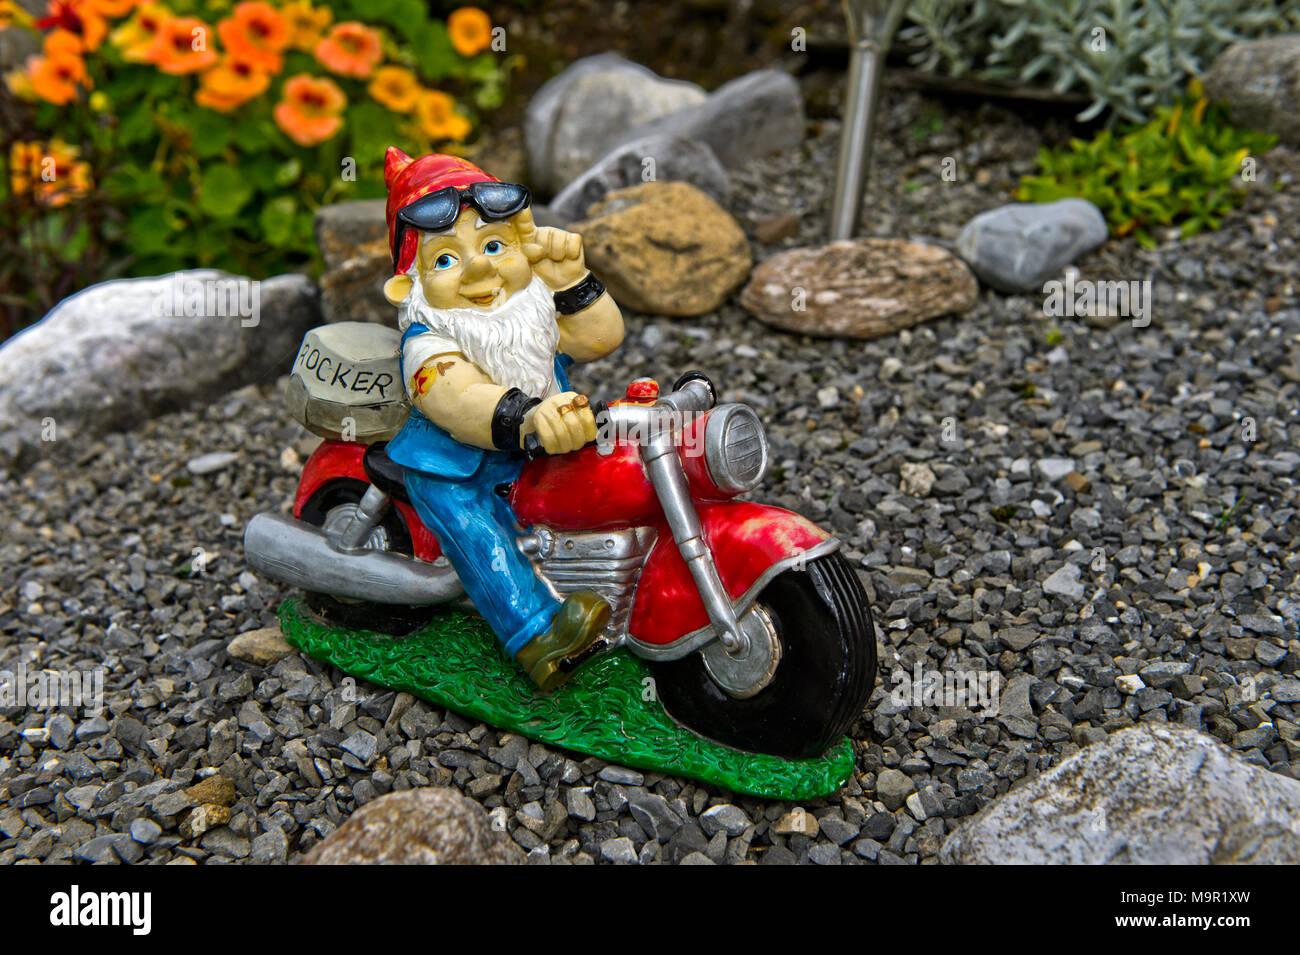 Garden gnome Rocker on motorcycle, Engelberg, Canton Obwalden, Switzerland Stock Photo